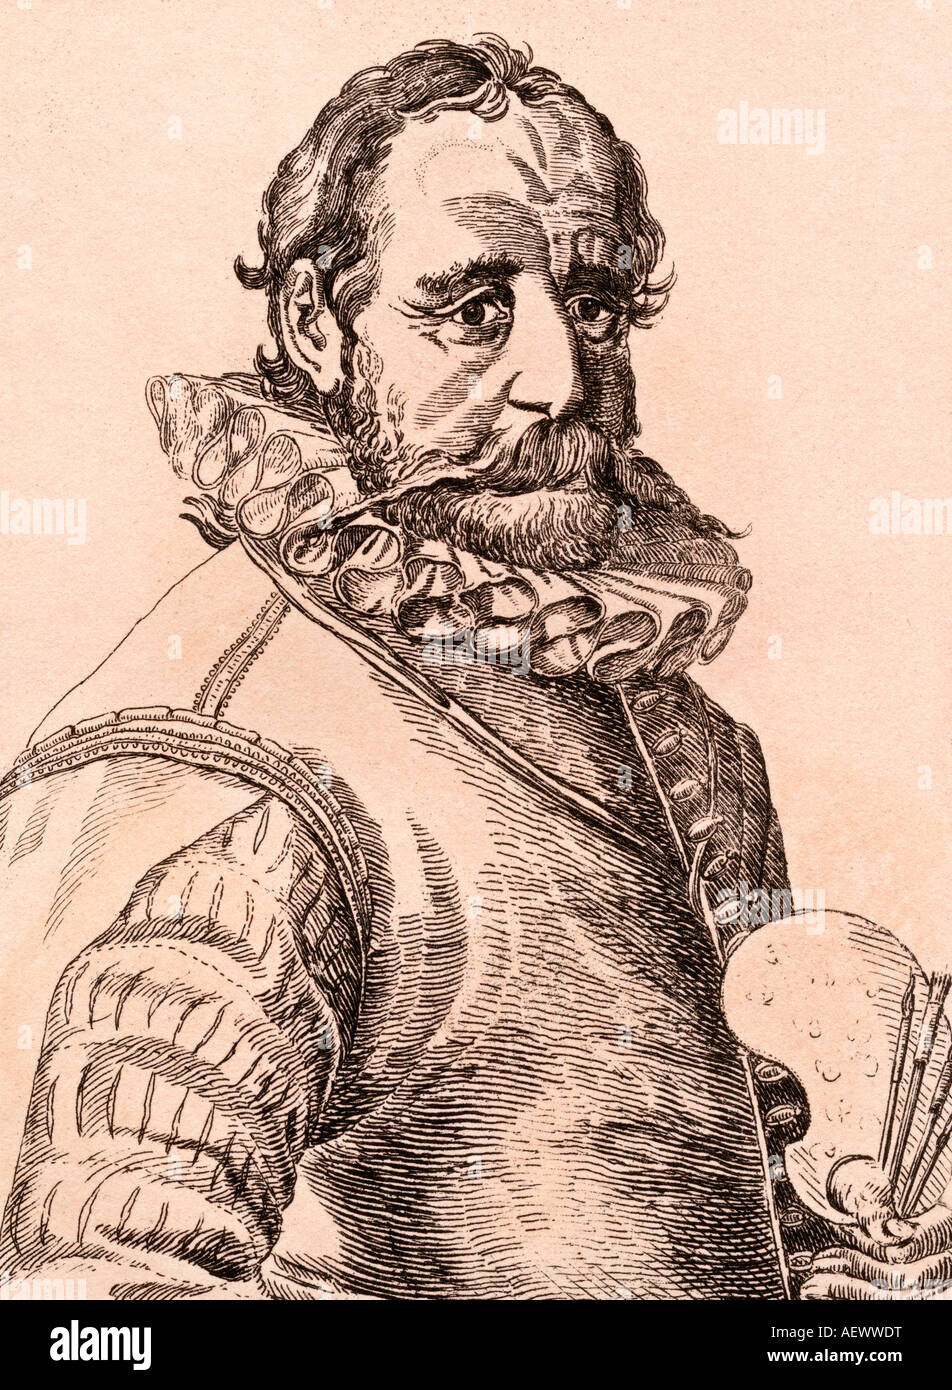 Hans Bol 1534 1593 artiste flamand Photo Stock